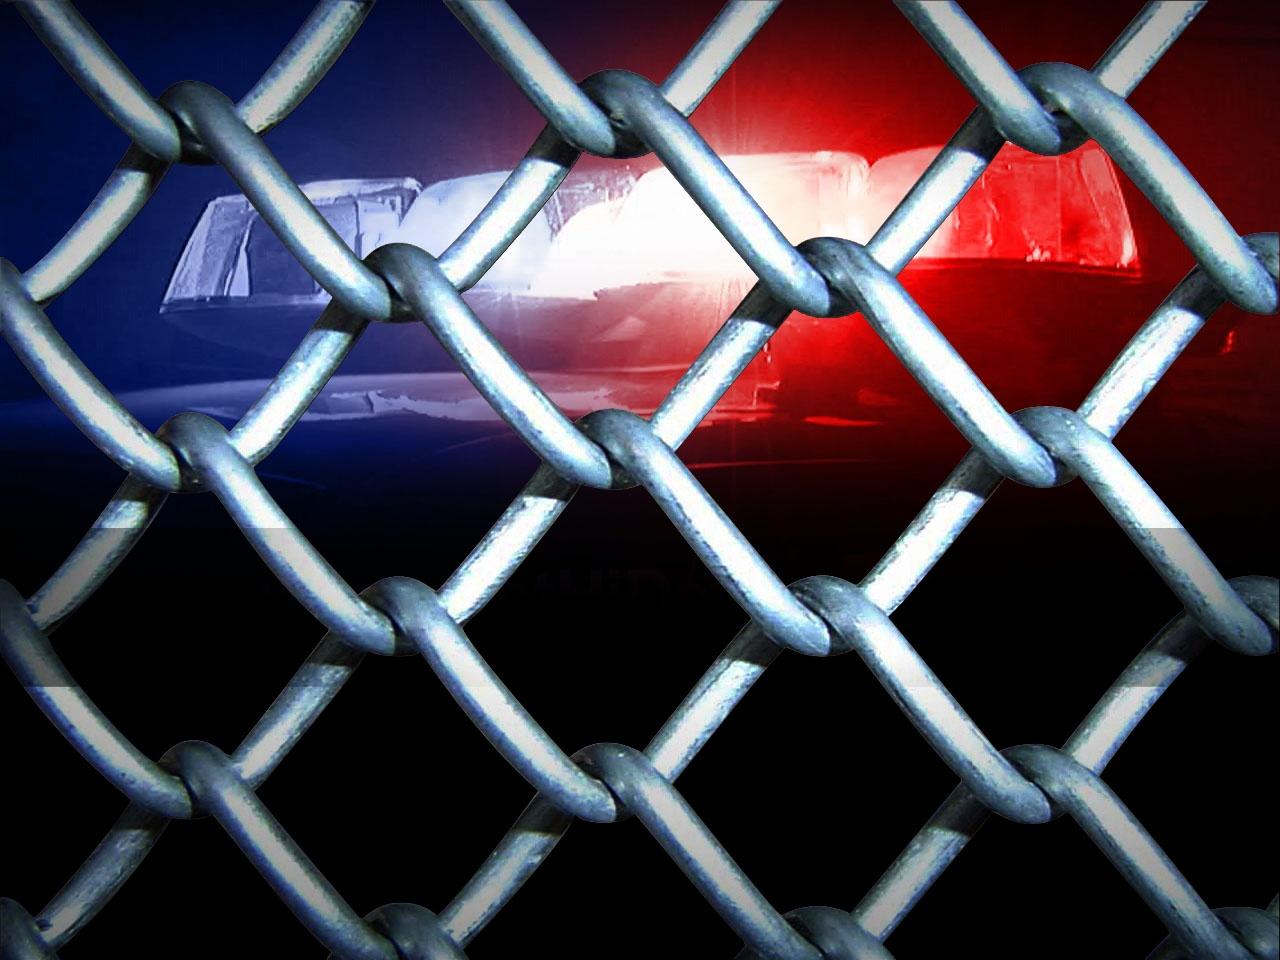 police lights_gate_1556924475228.jpg.jpg